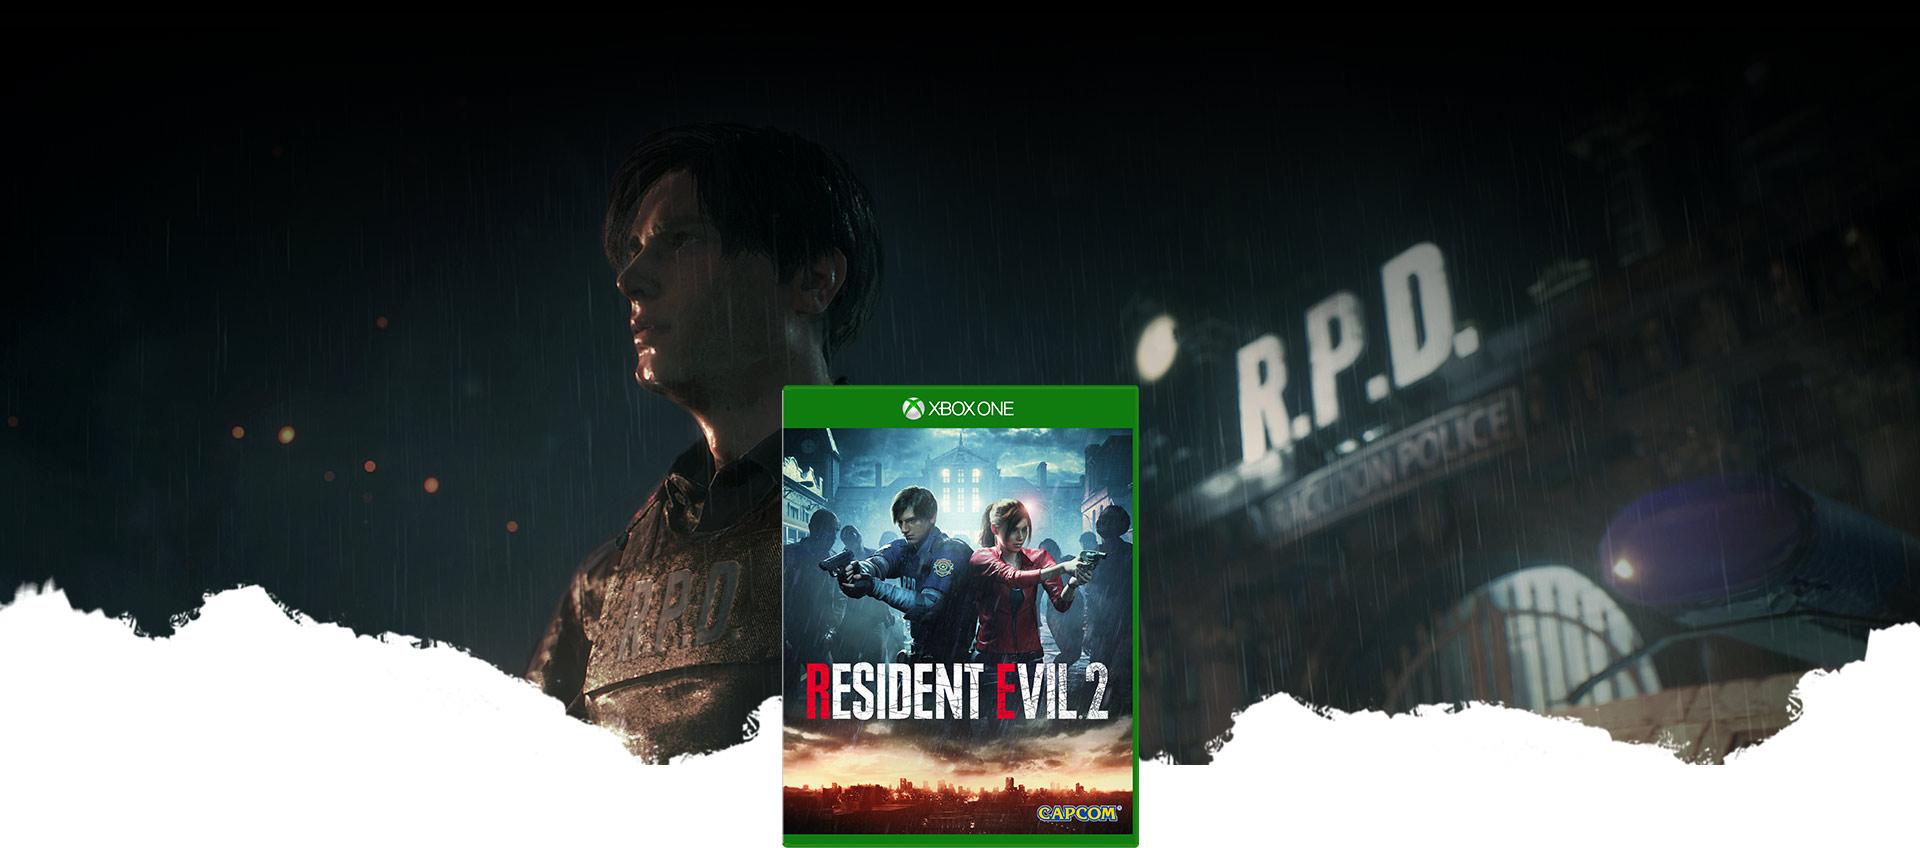 Resident Evil 2 外包裝圖,Leon Kennedy 站在雨中,旁邊是浣熊市警察局